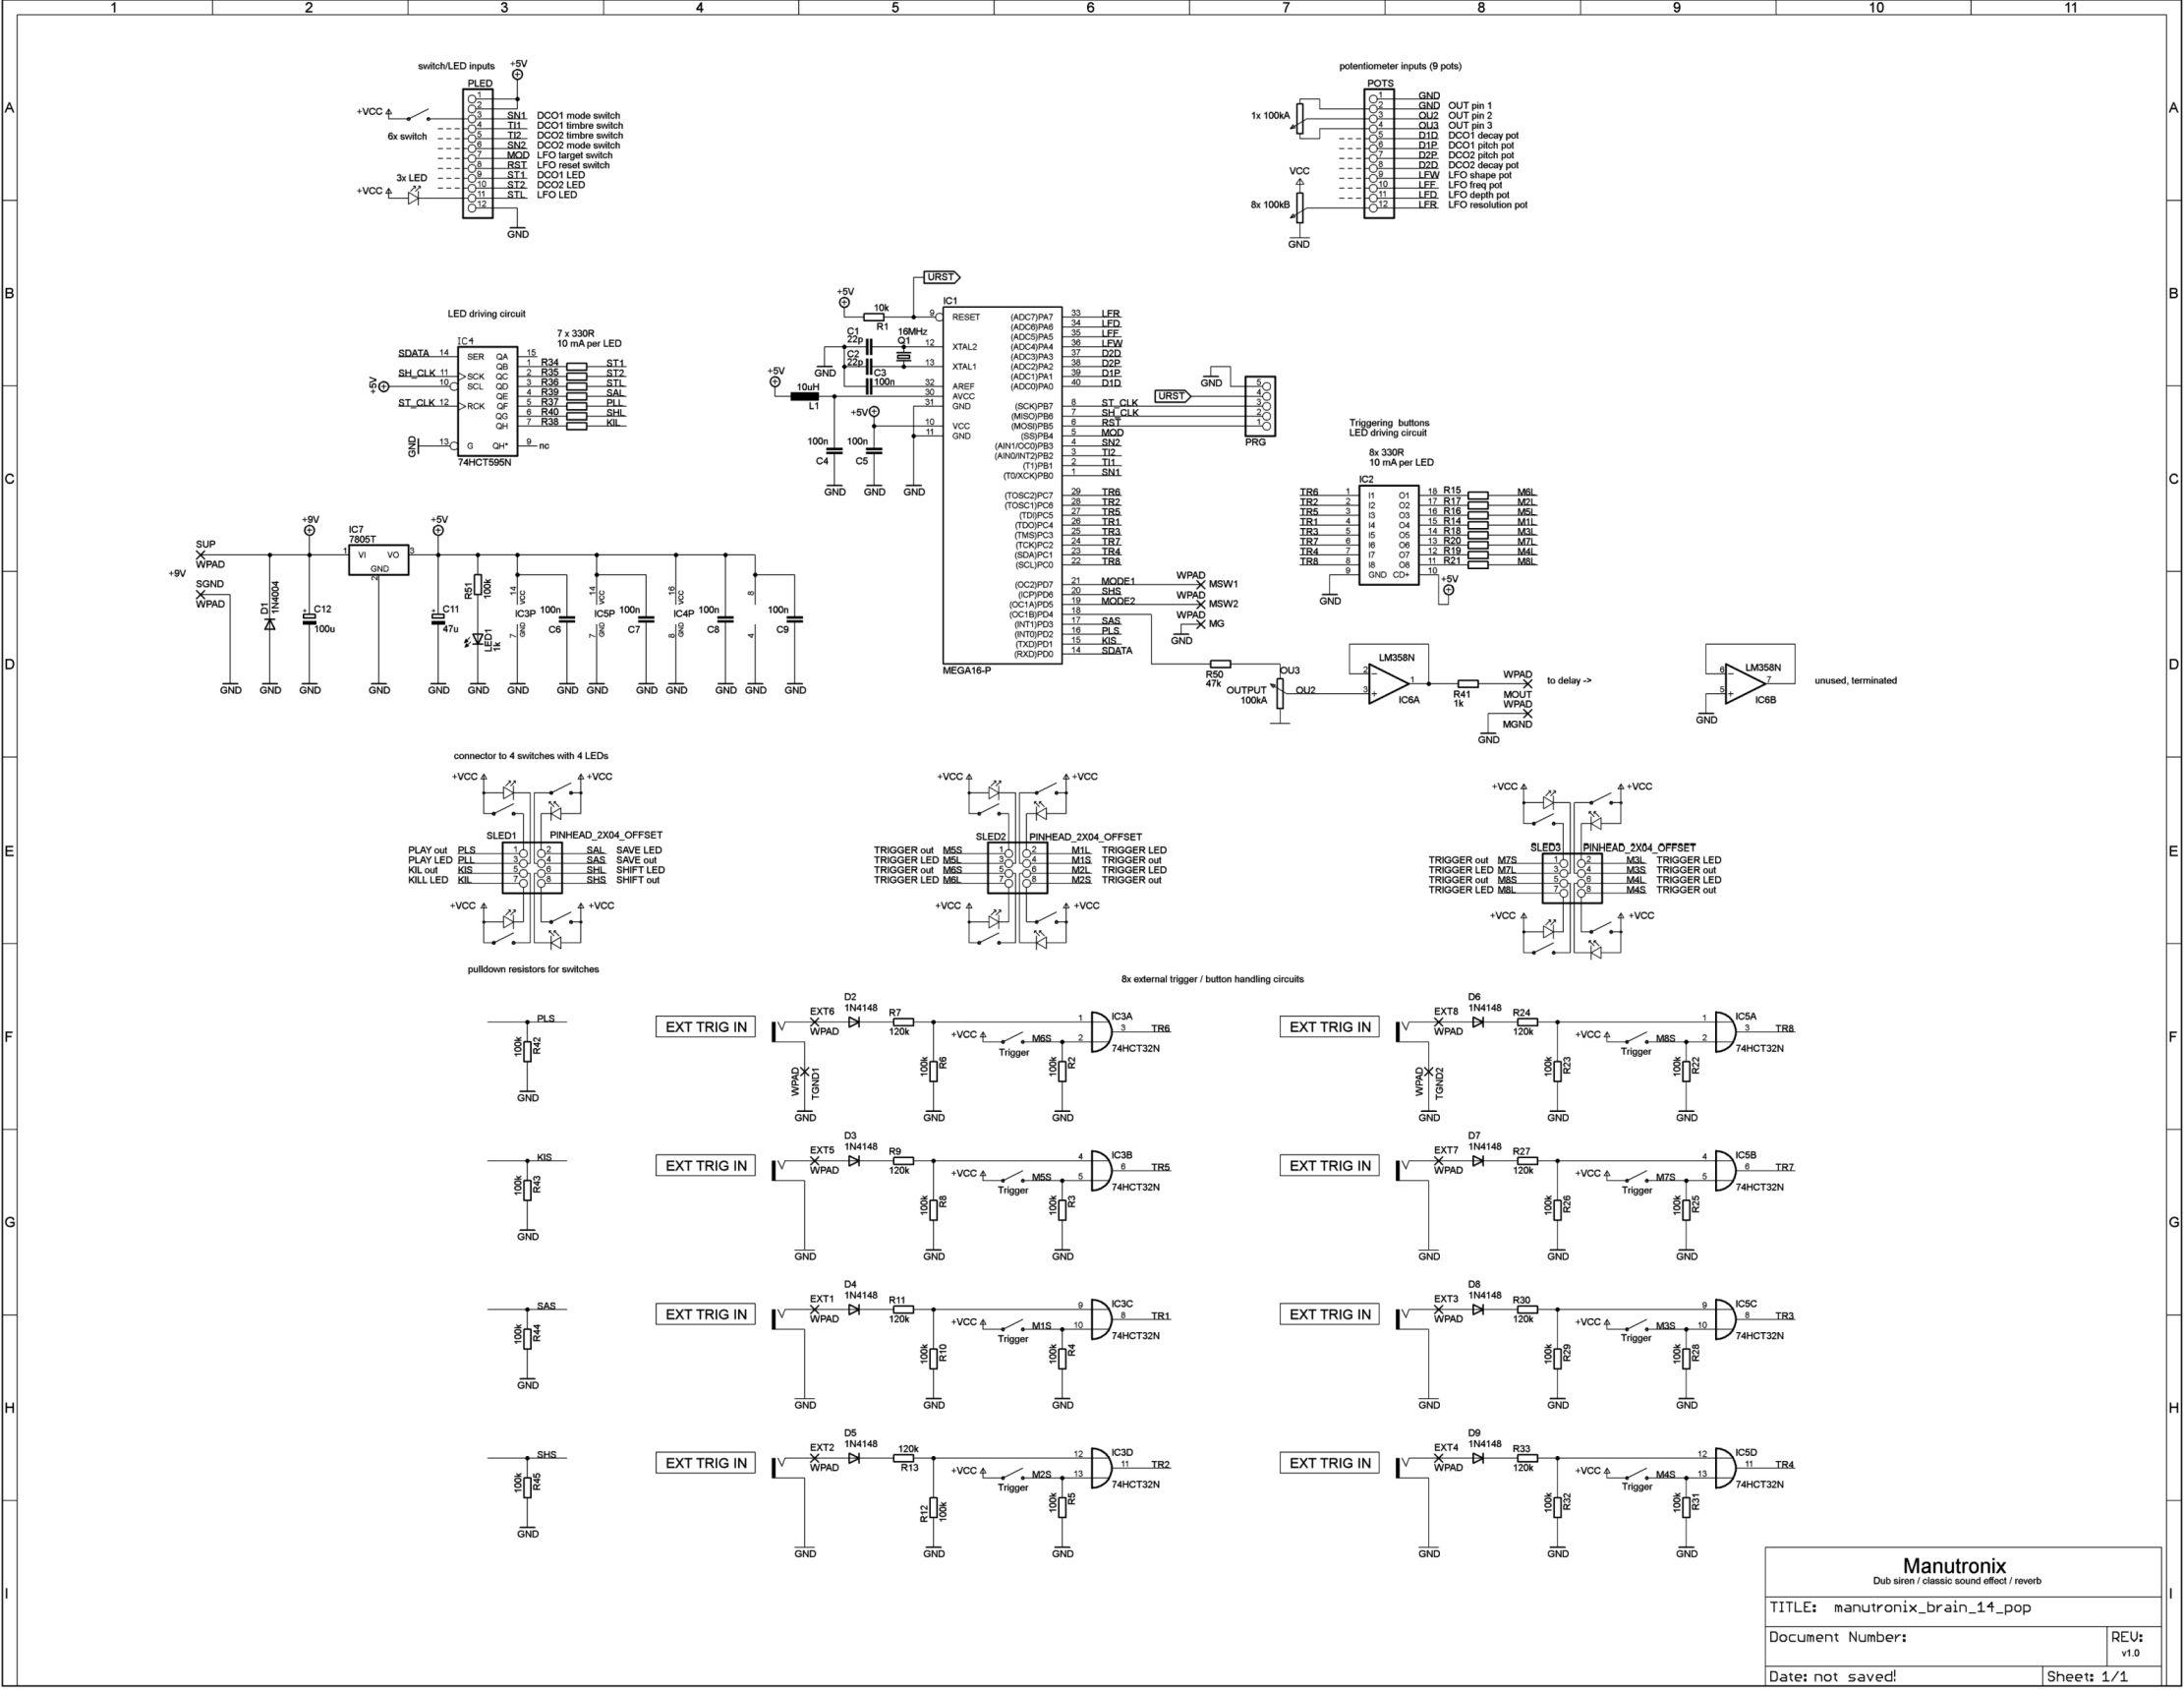 Manutronix full schematics